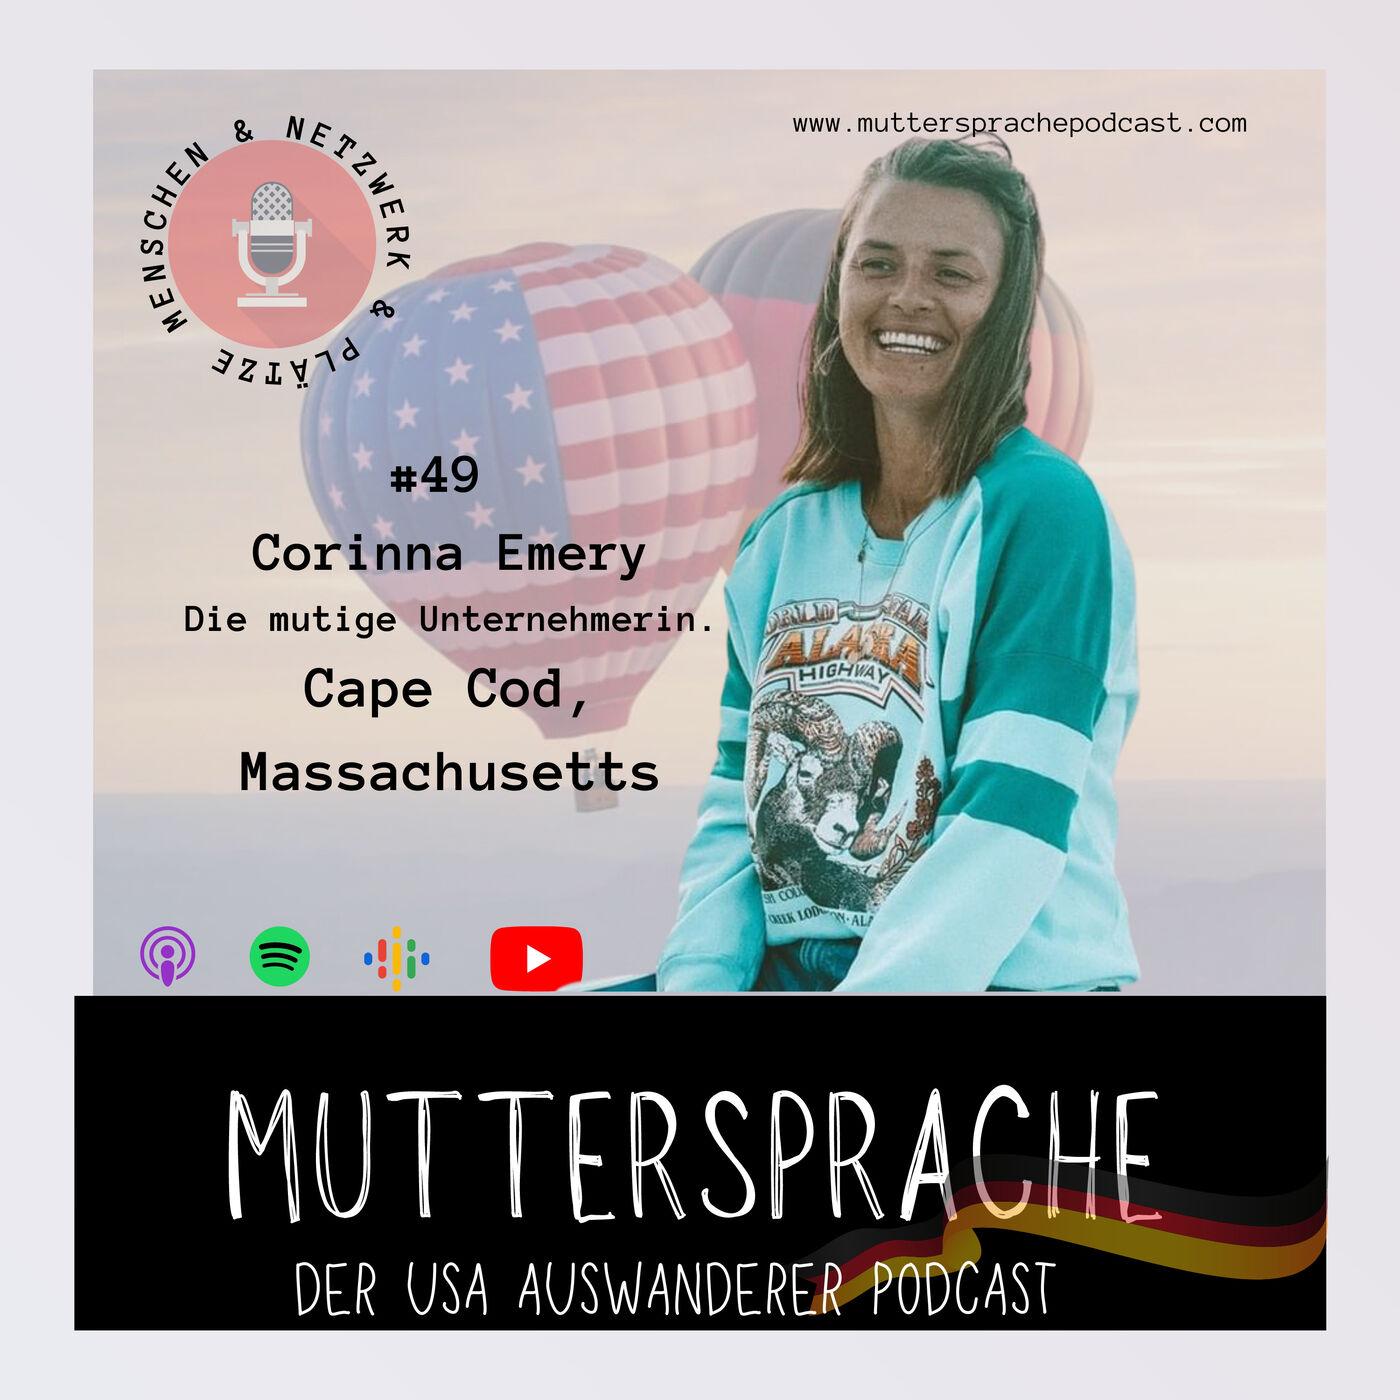 Folge 49: Die mutige Unternehmerin - CORINNA EMERY, Cape Cod, Massachusetts